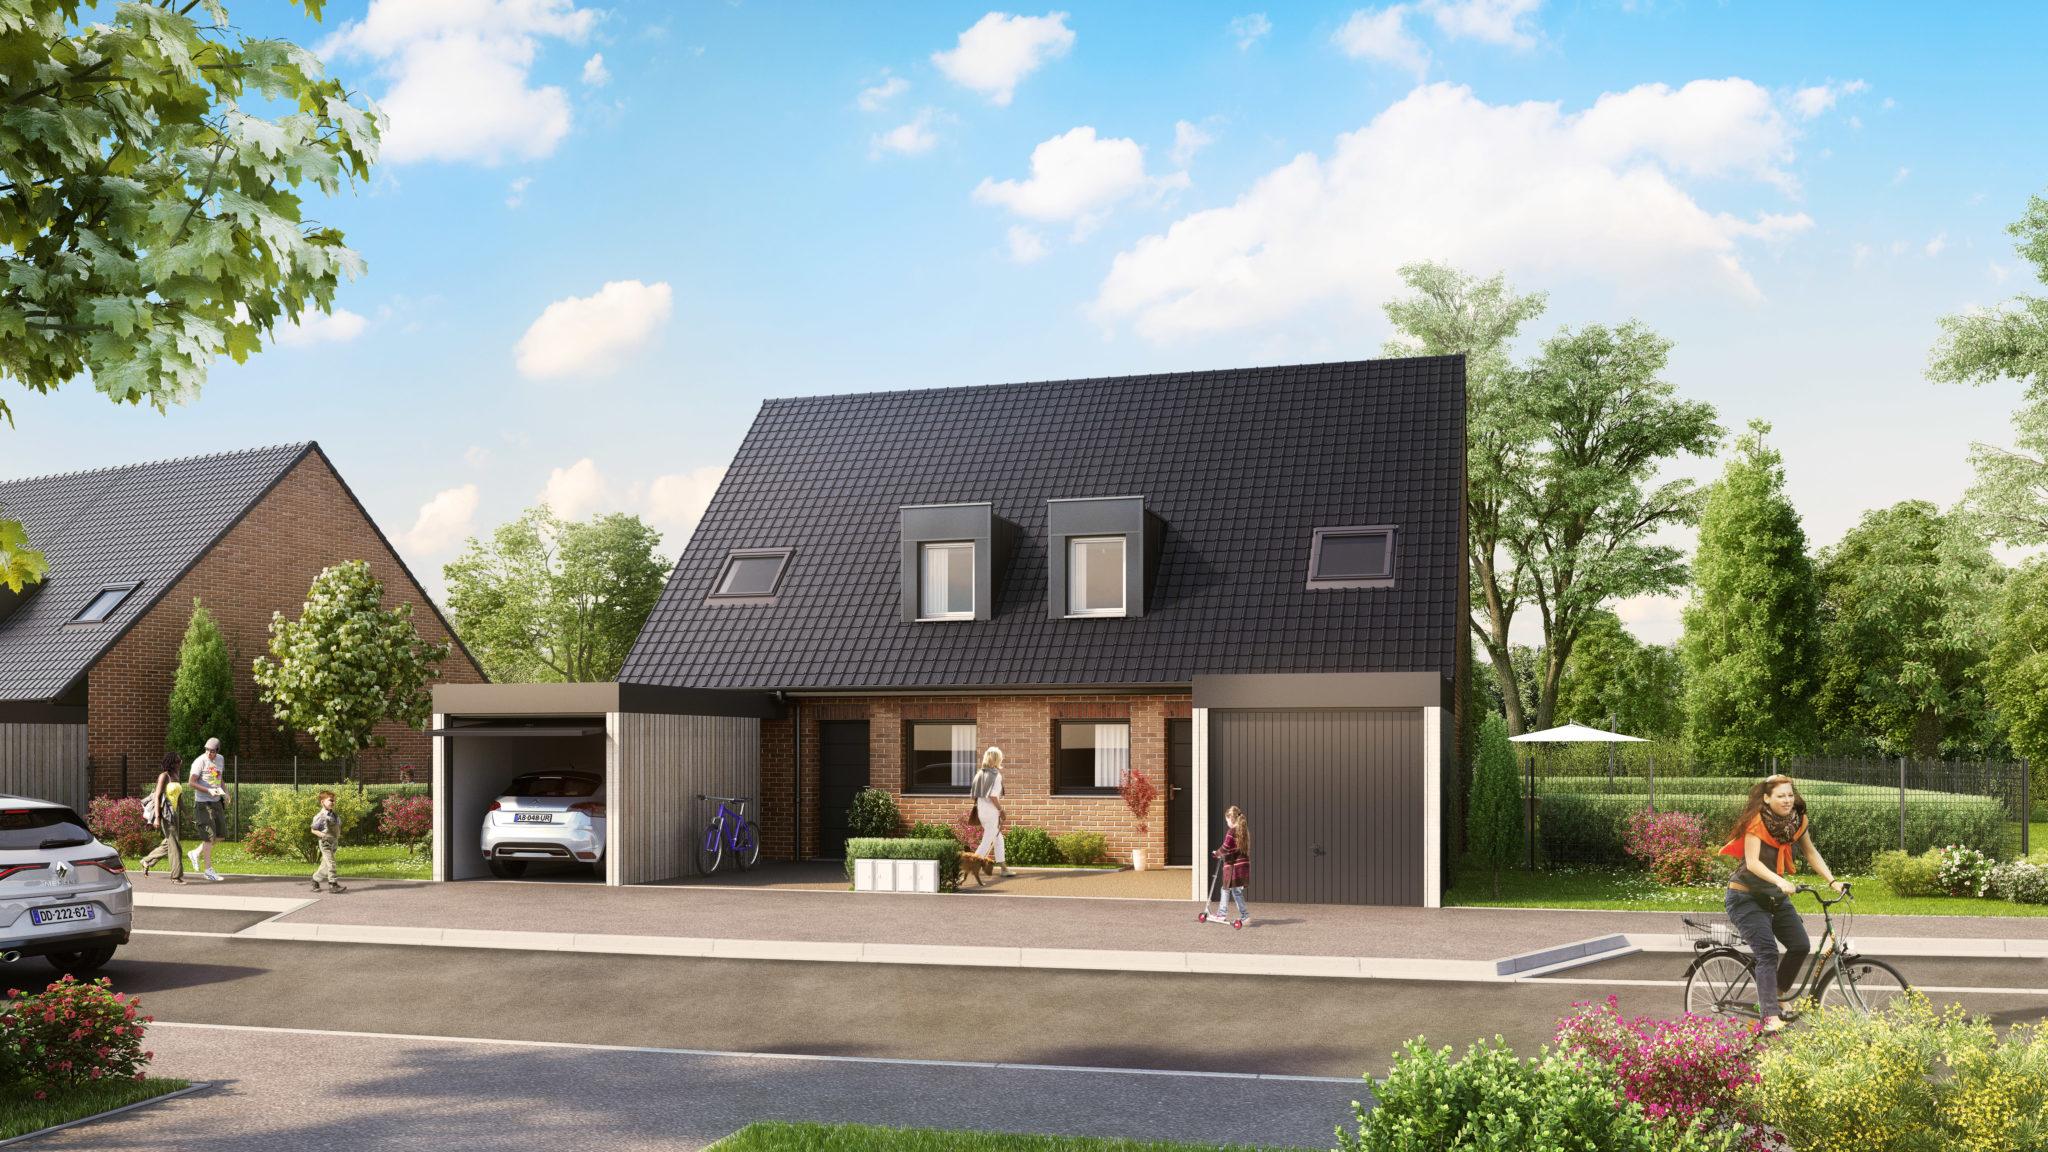 Maison neuve en psla lestrem avec la srcj for Acheter maison neuve 29